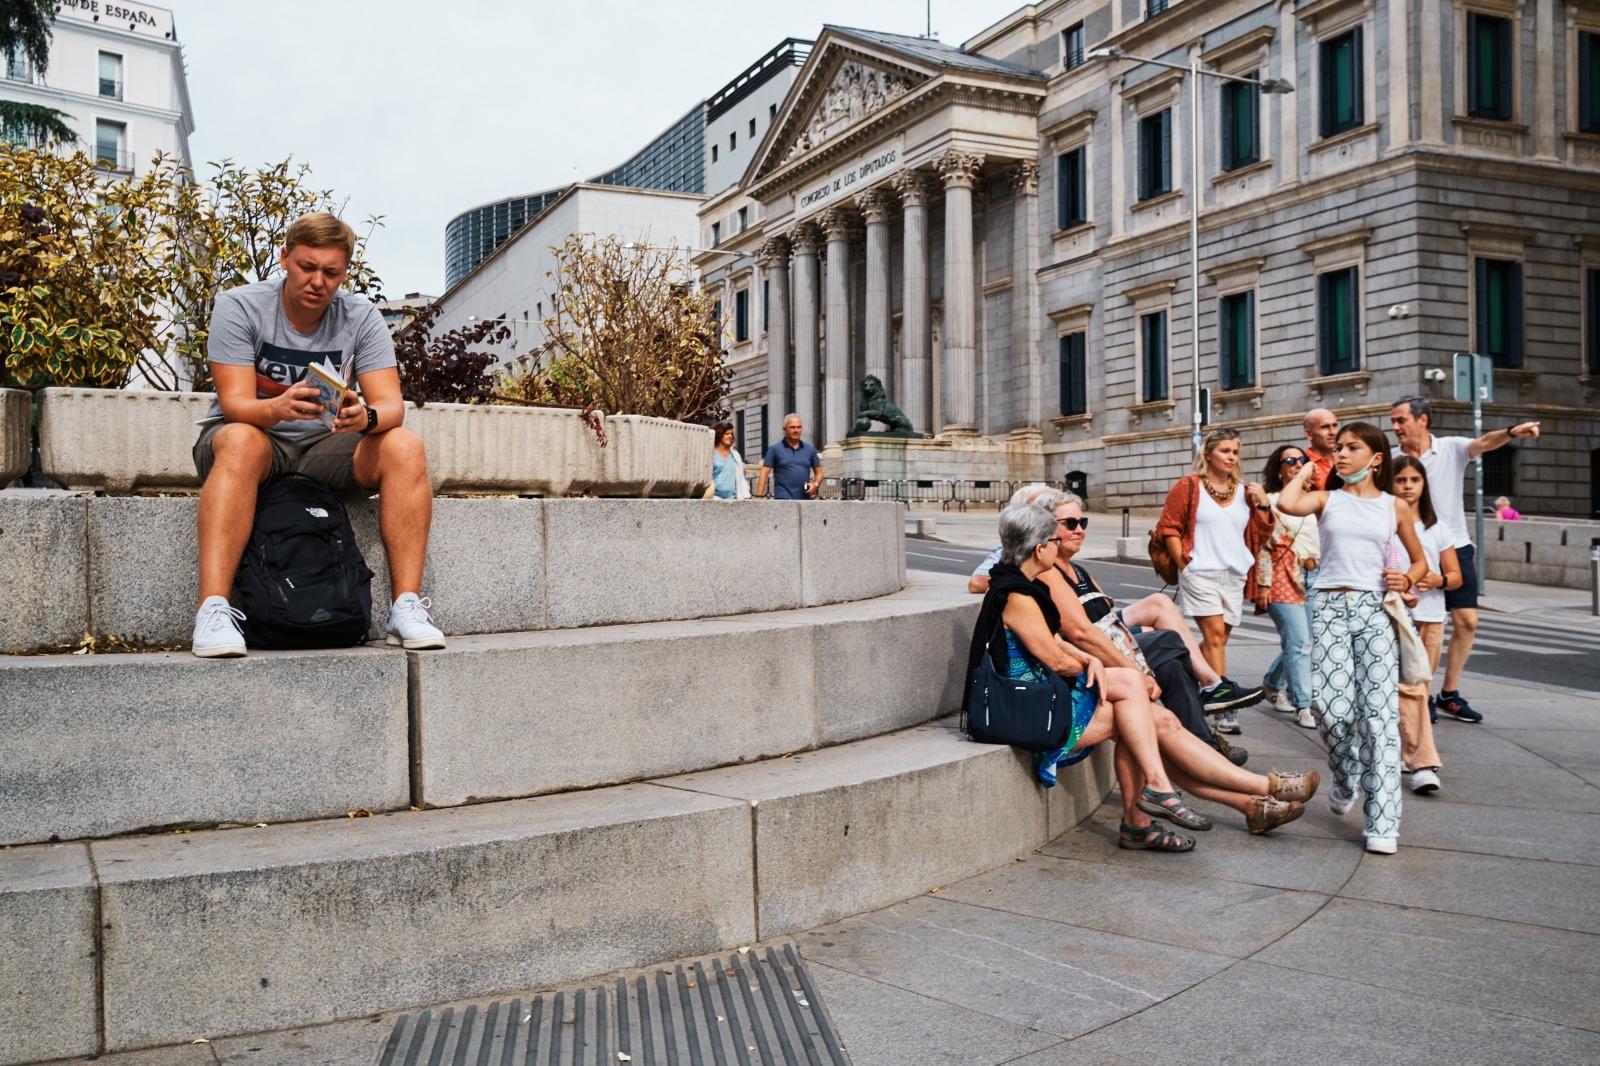 Taller de fotografía de calle en Madrid con rober tomas